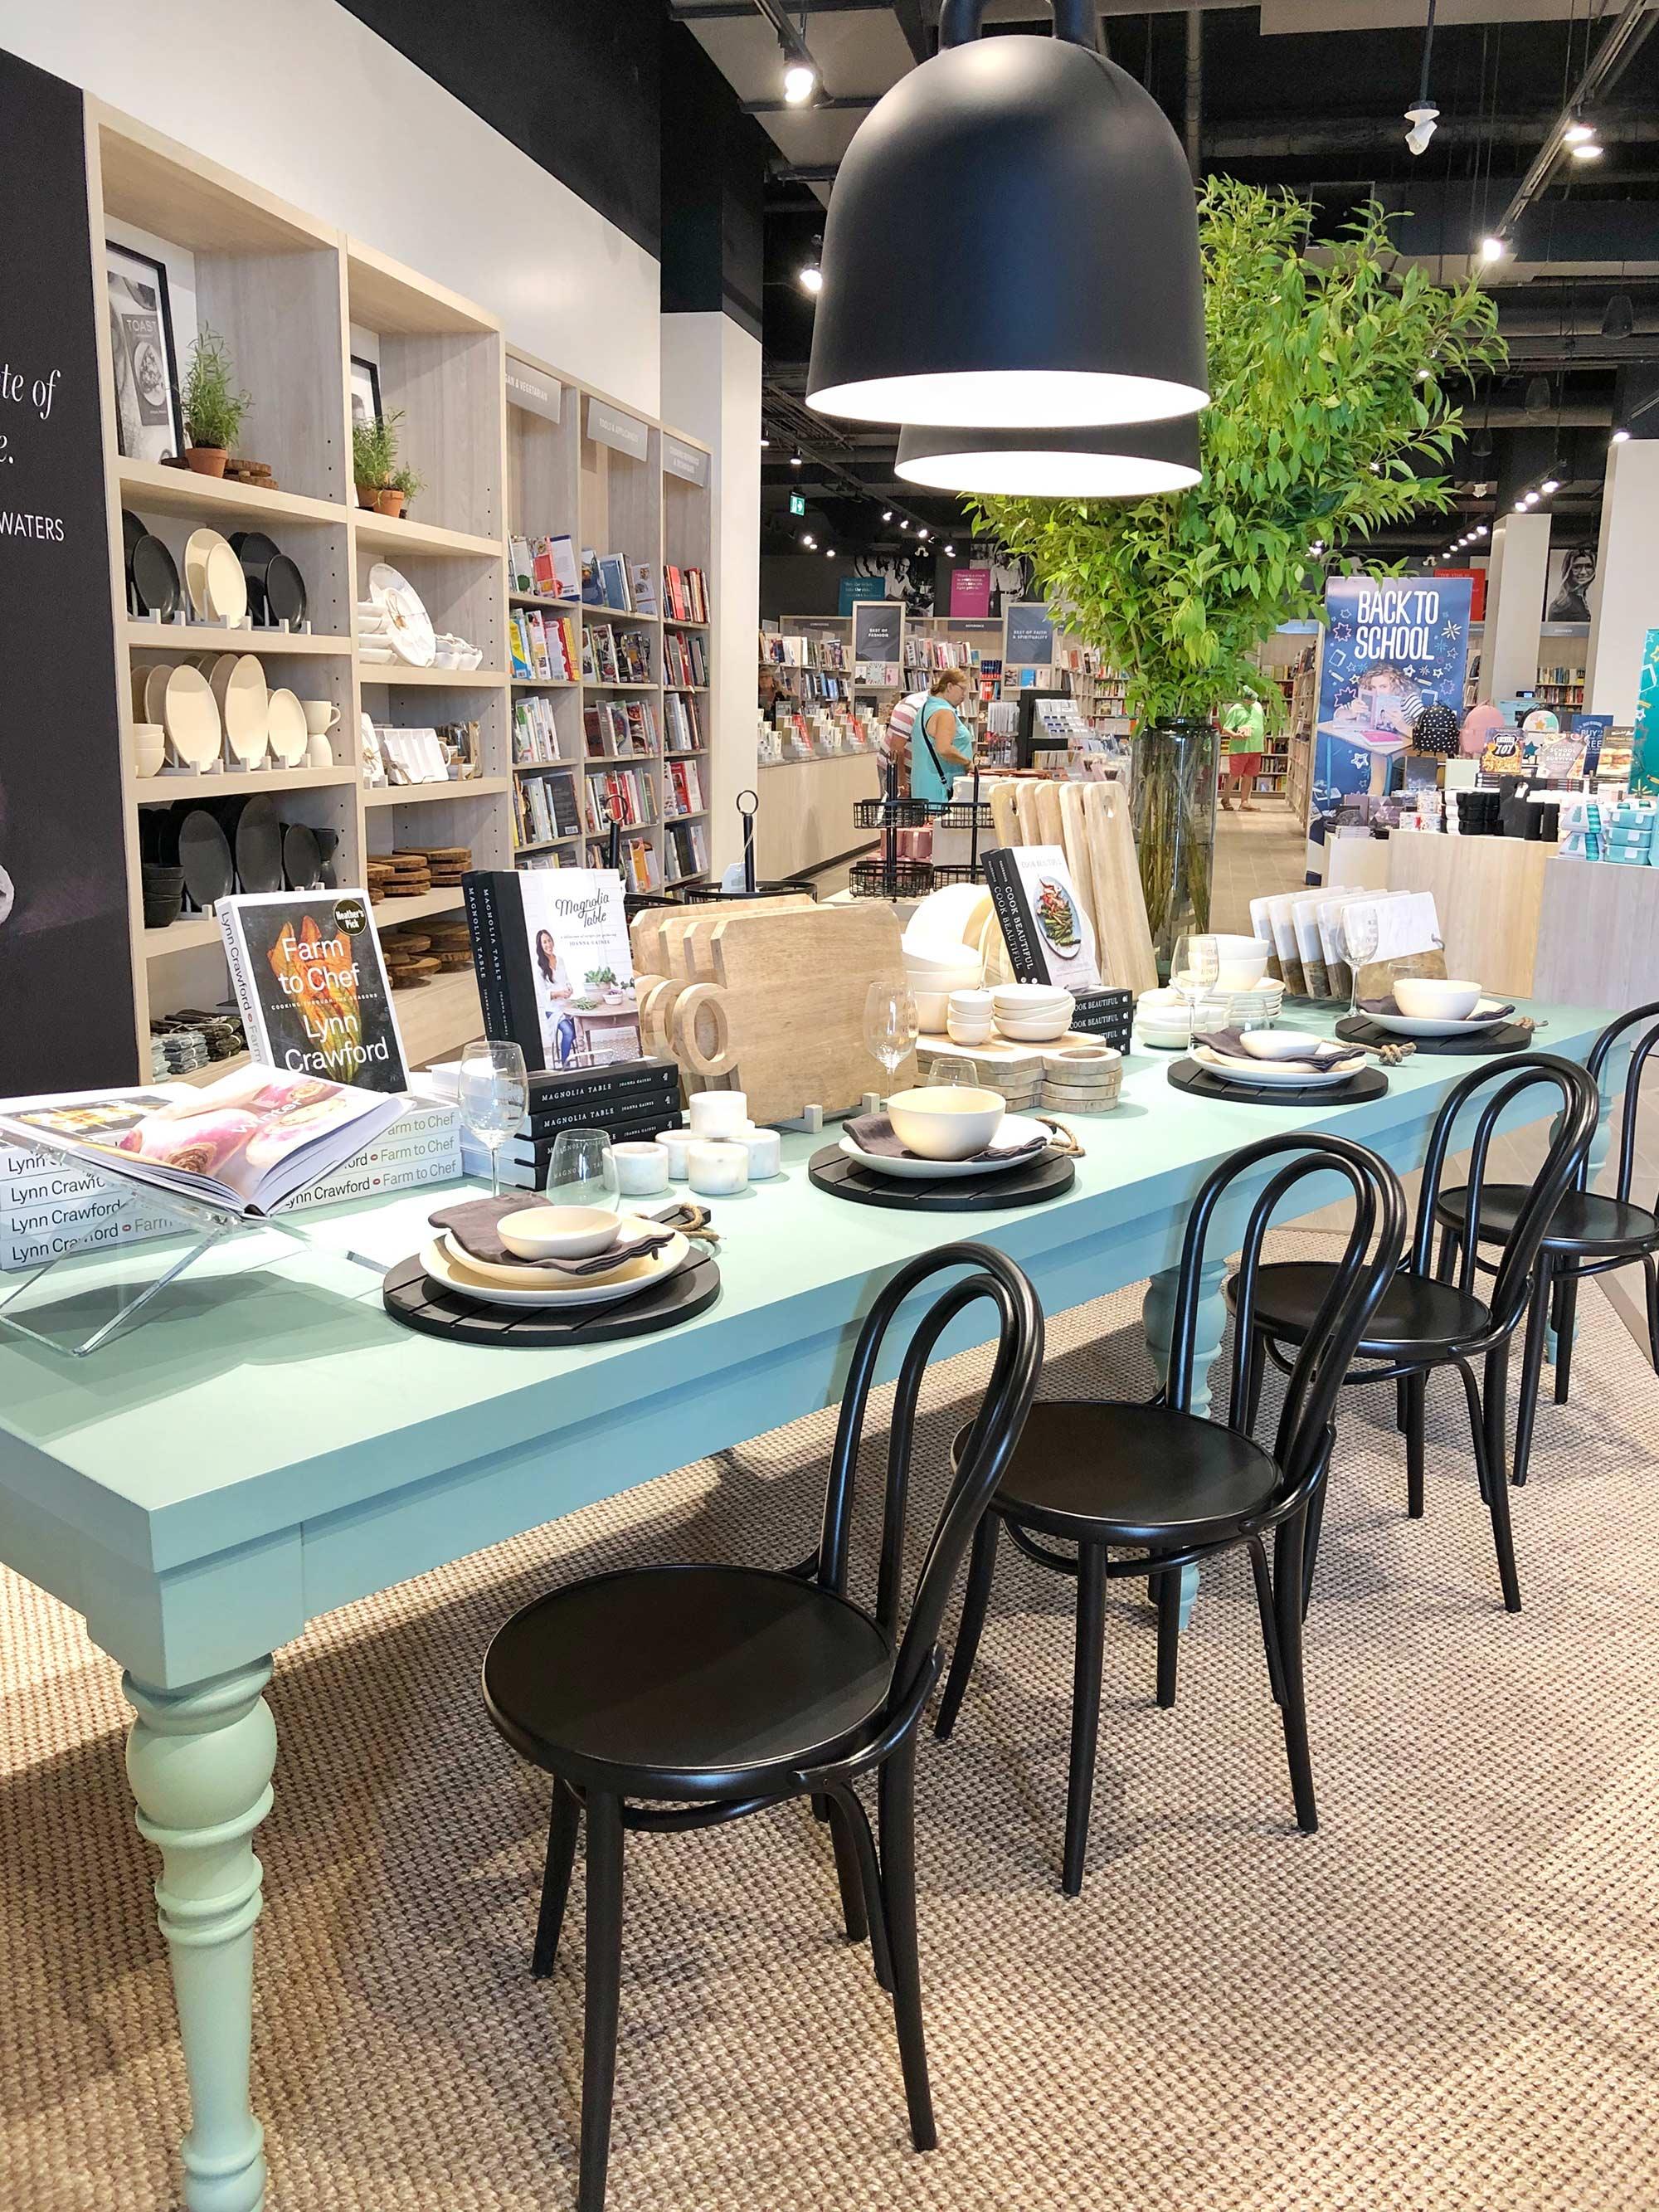 Indigo Kitchener Cookbook and Kitchenware Section